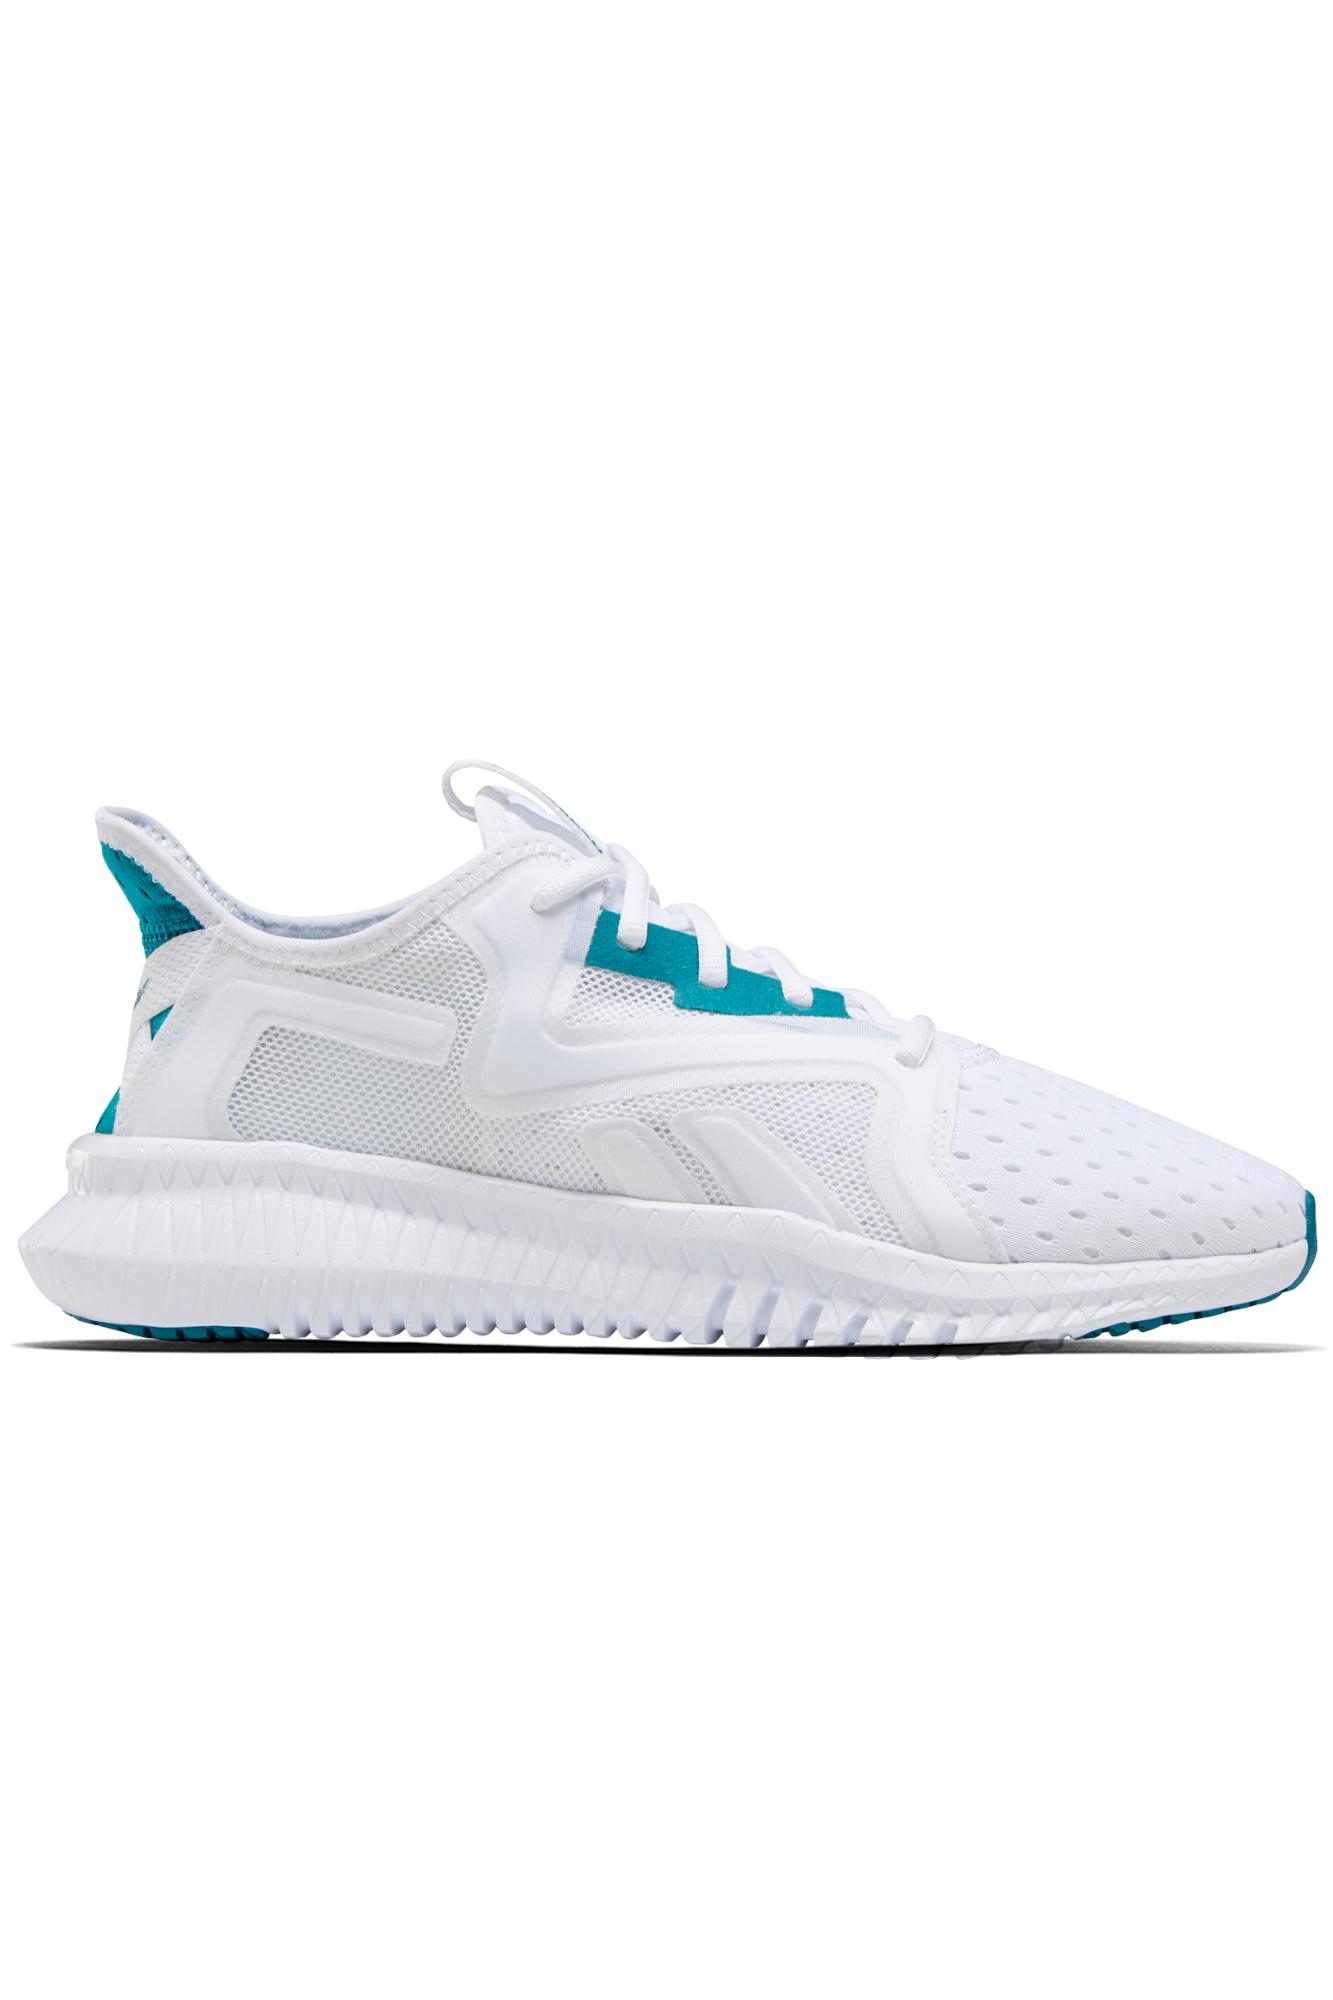 Reebok Producent UrbanGames Nike, adidas, adidas